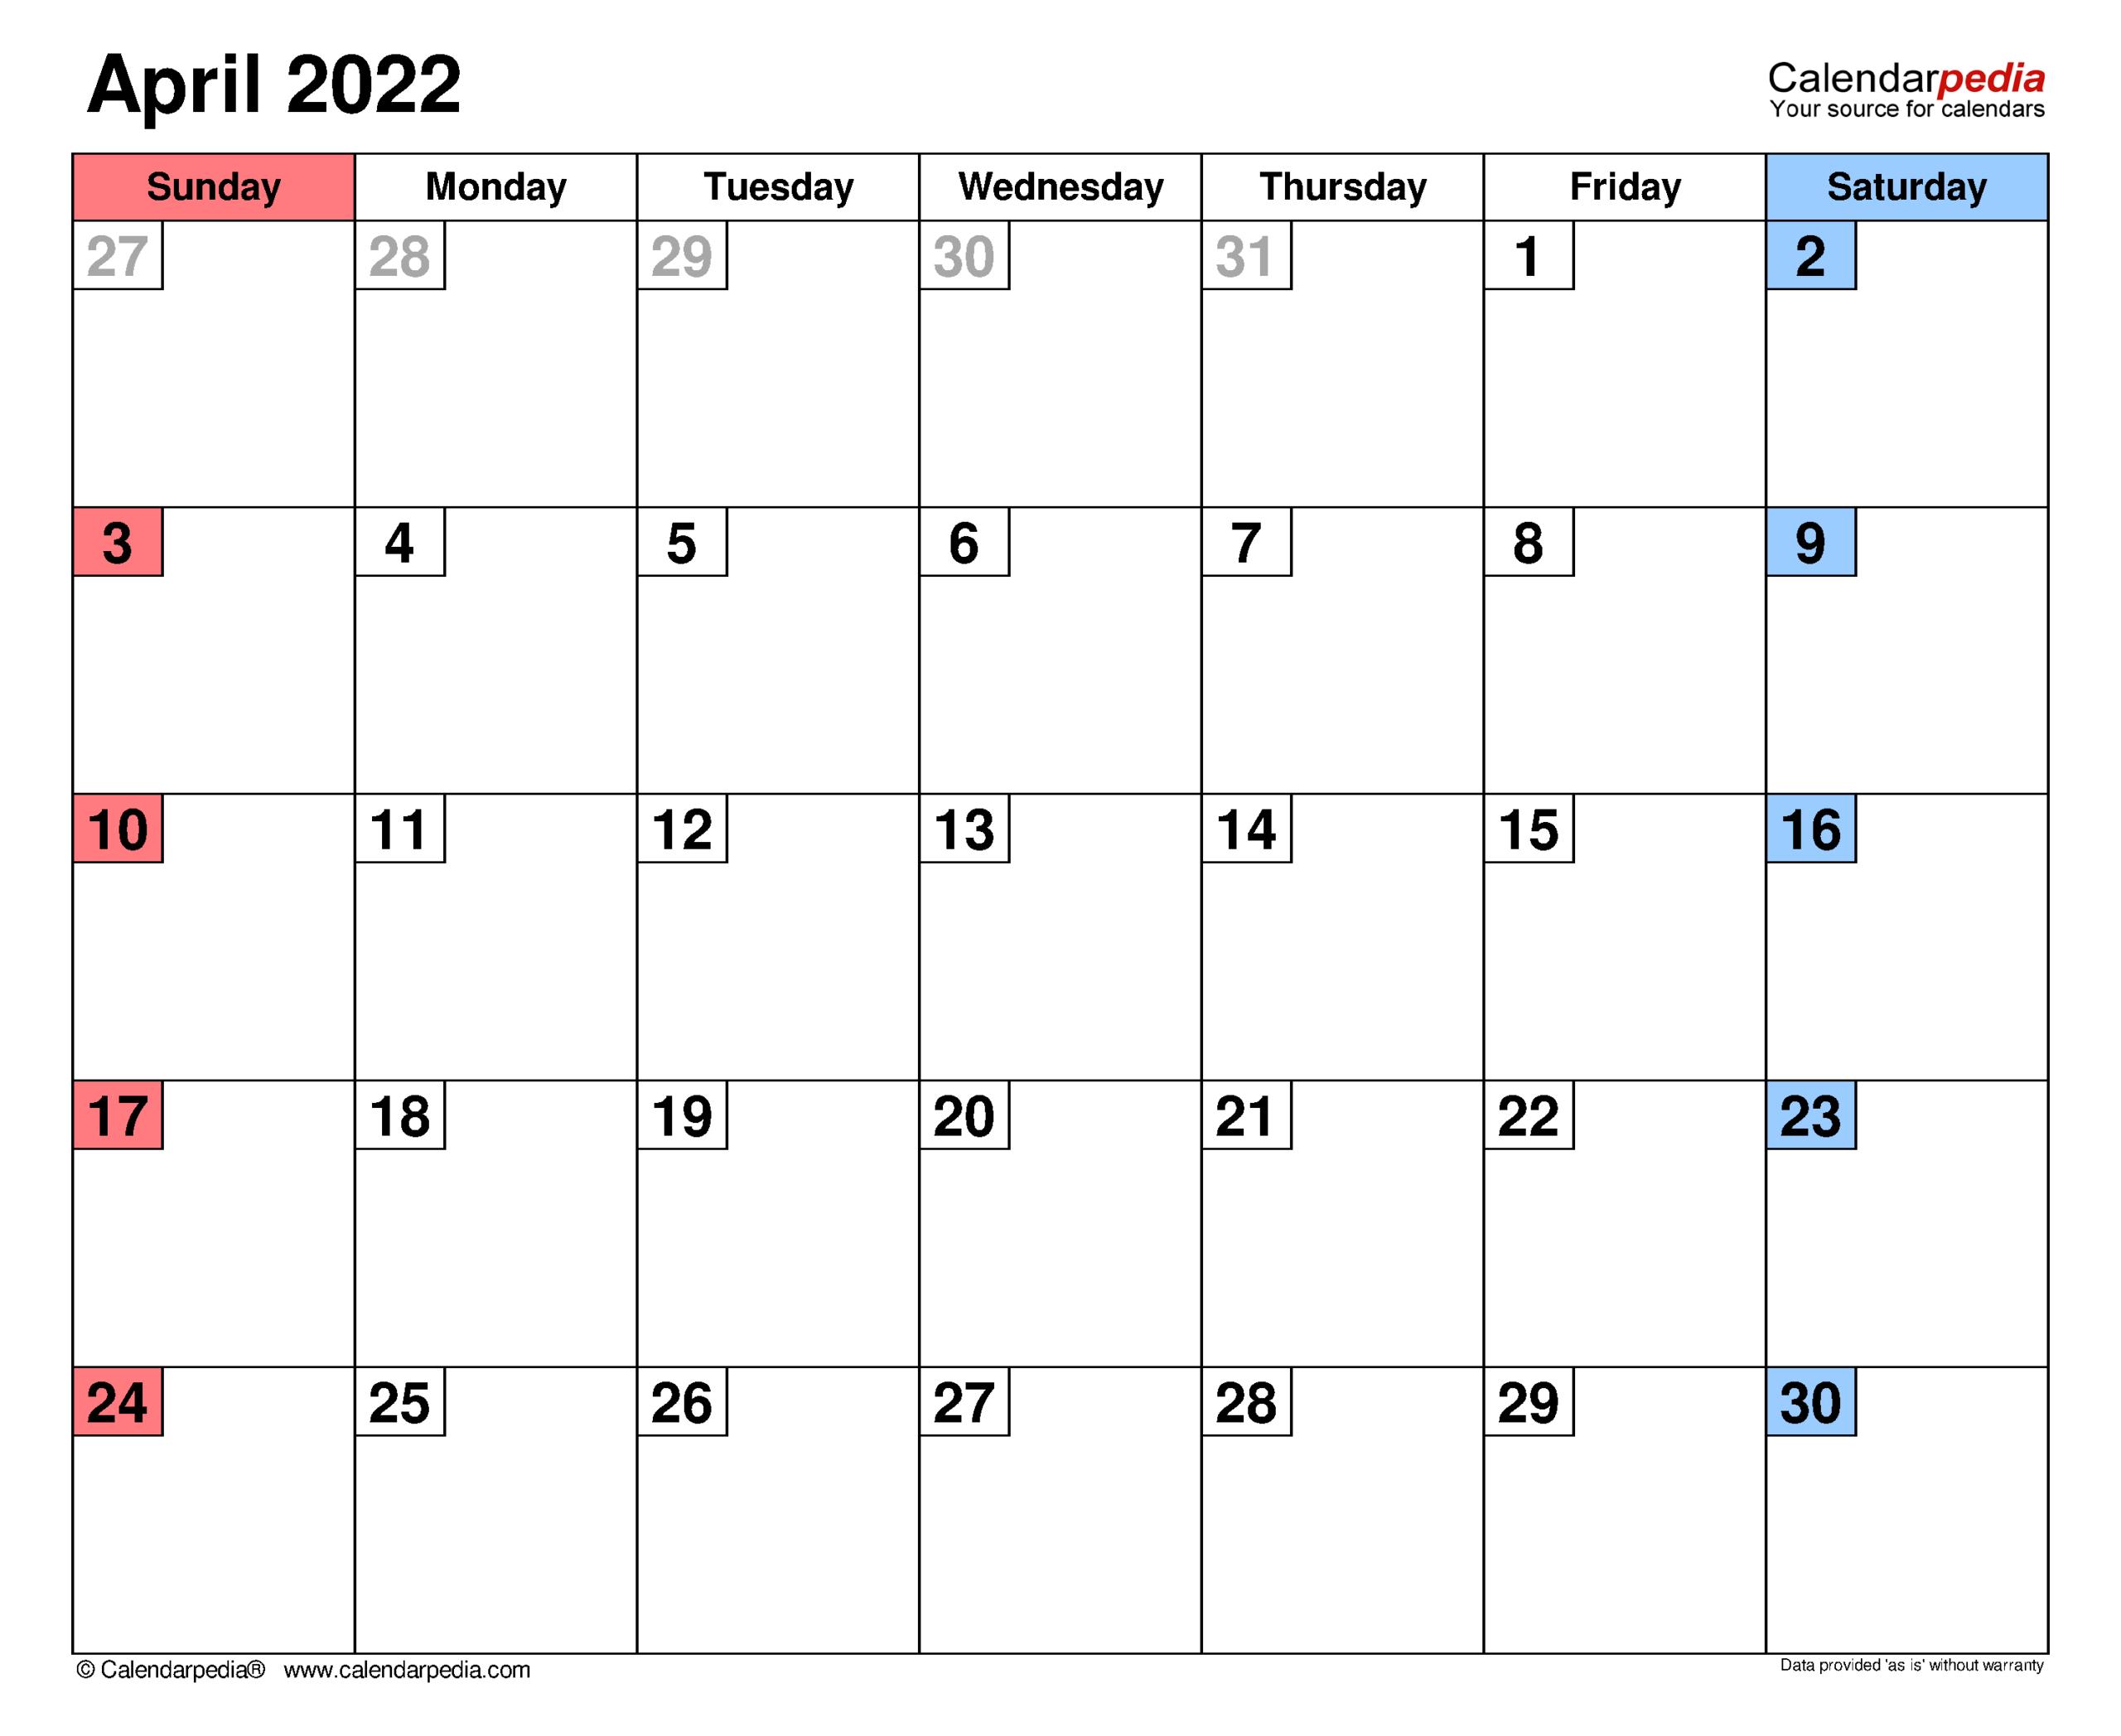 April 2022 Calendar | Templates For Word, Excel And Pdf for Calendar 2022 April Print Now